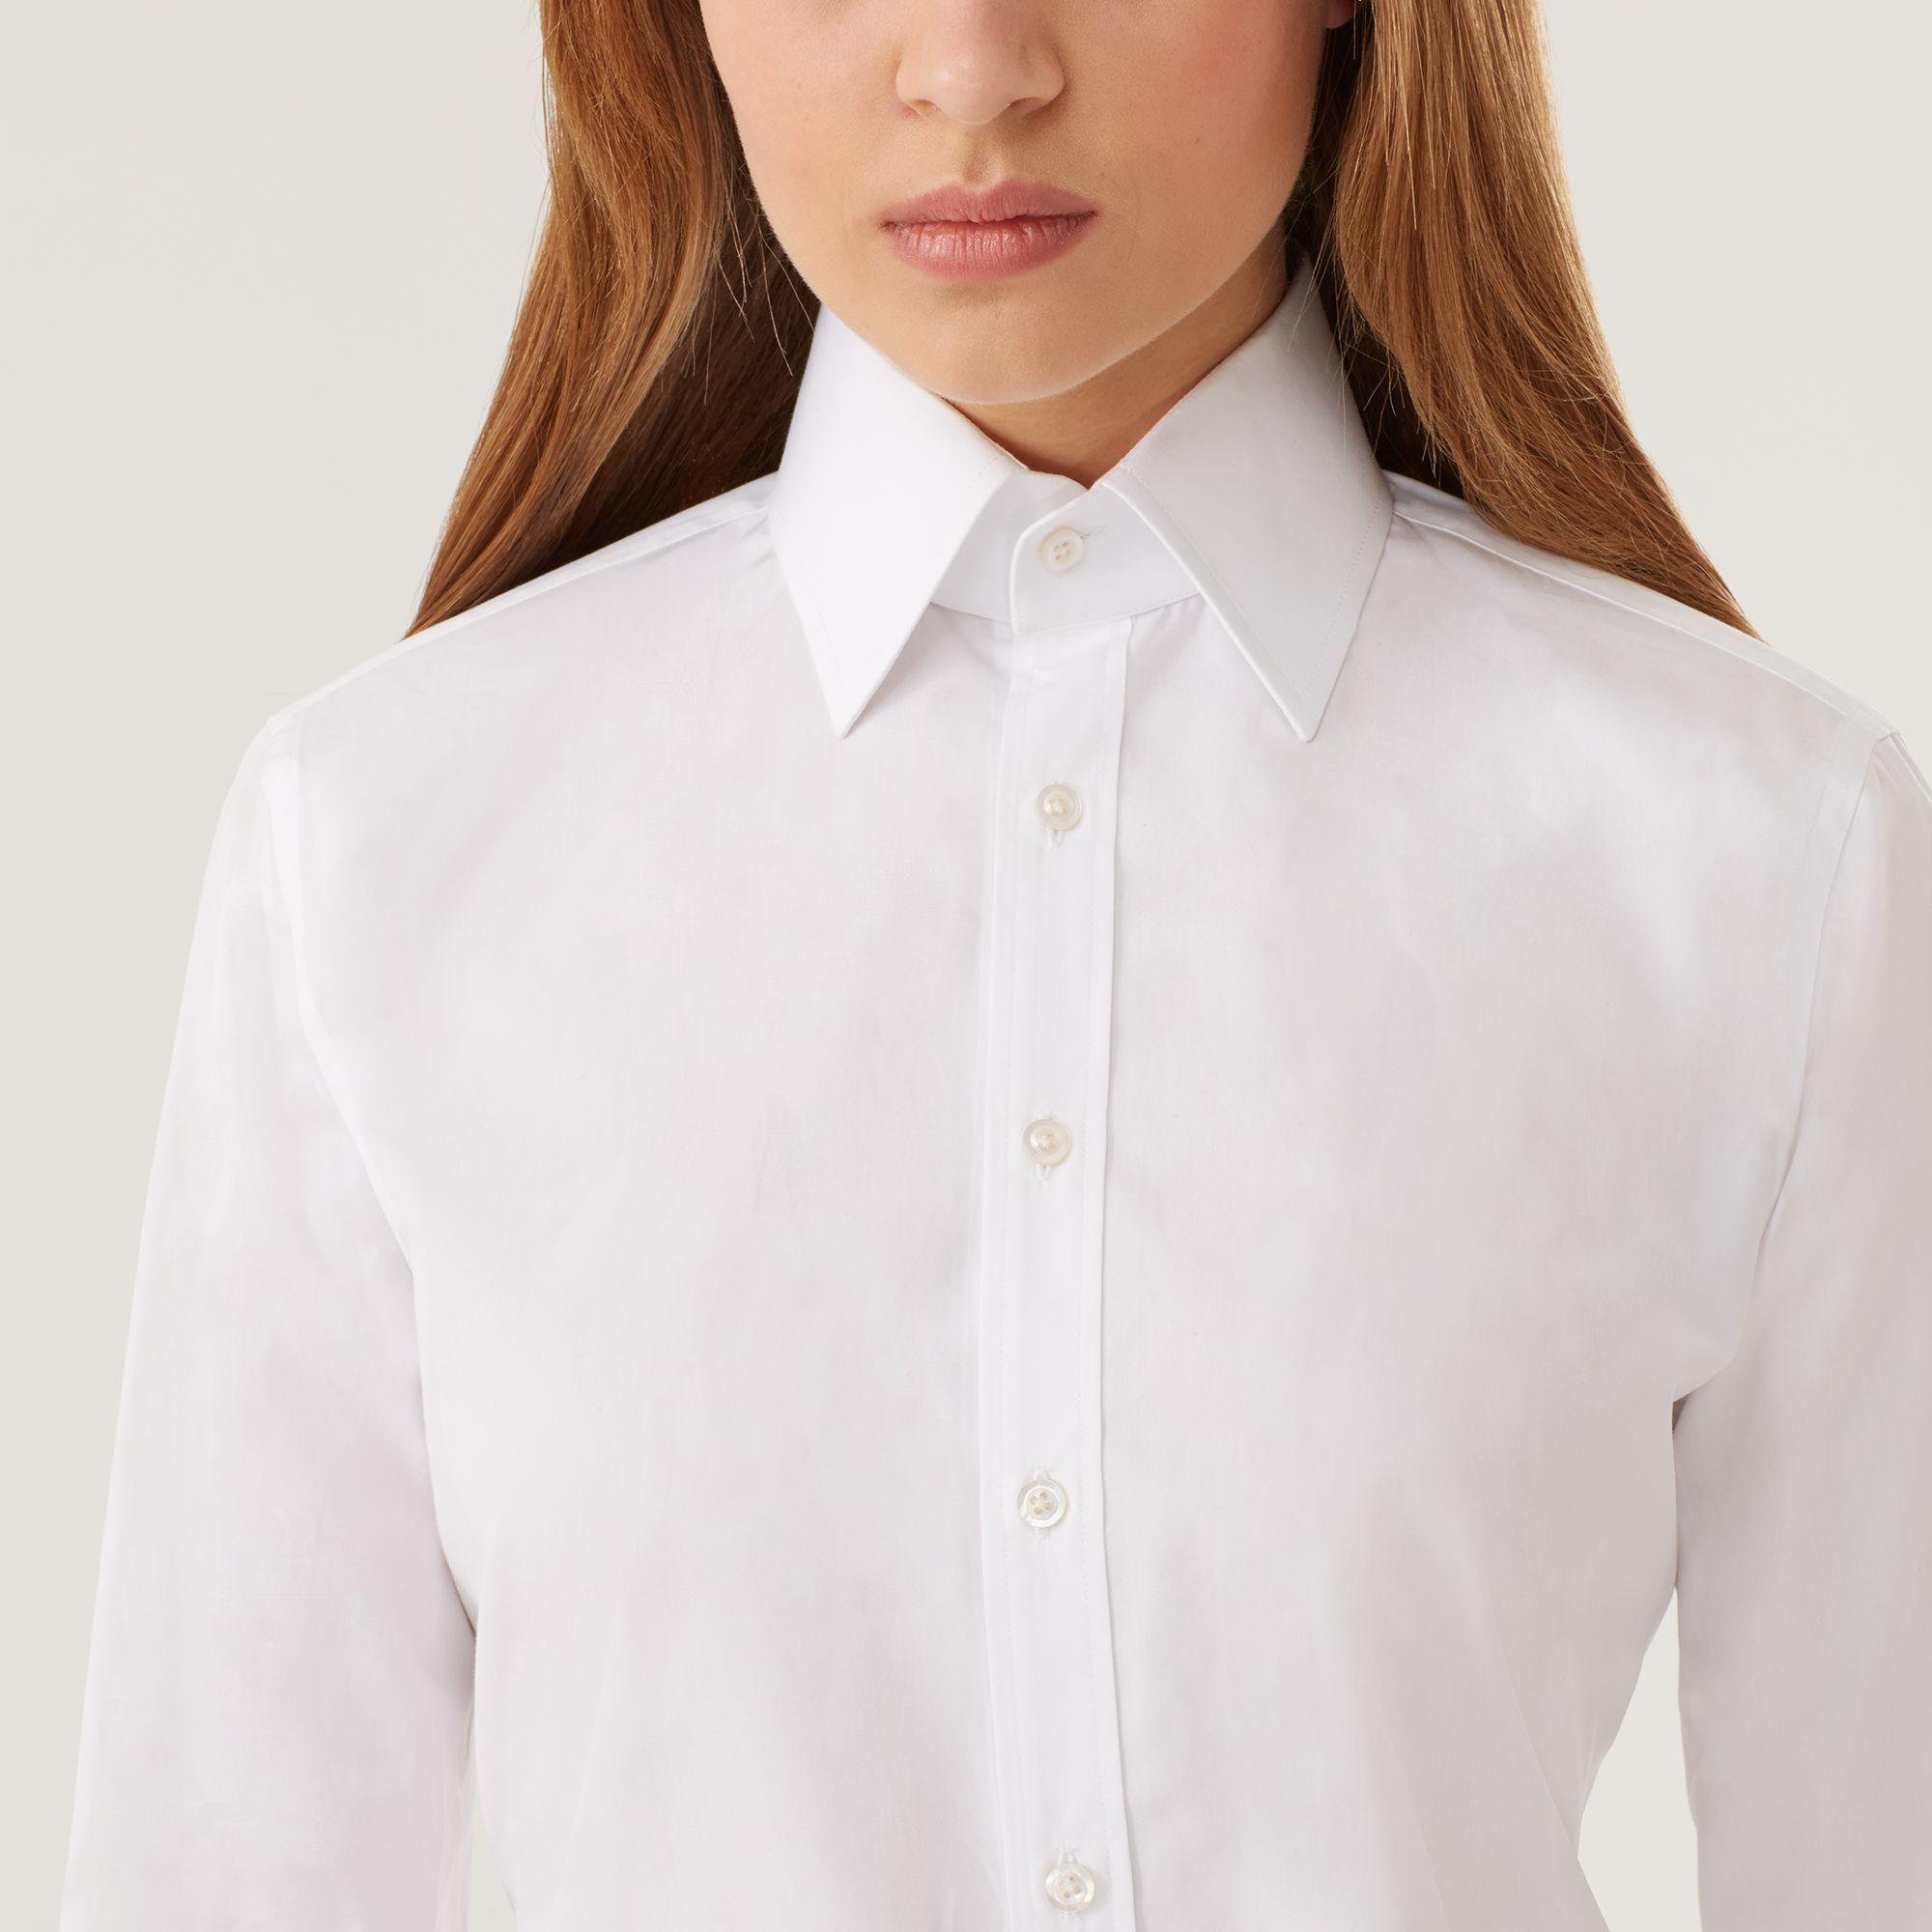 Ralph Lauren Trafalgar Shirt in 2020 | Weiße hemden frauen